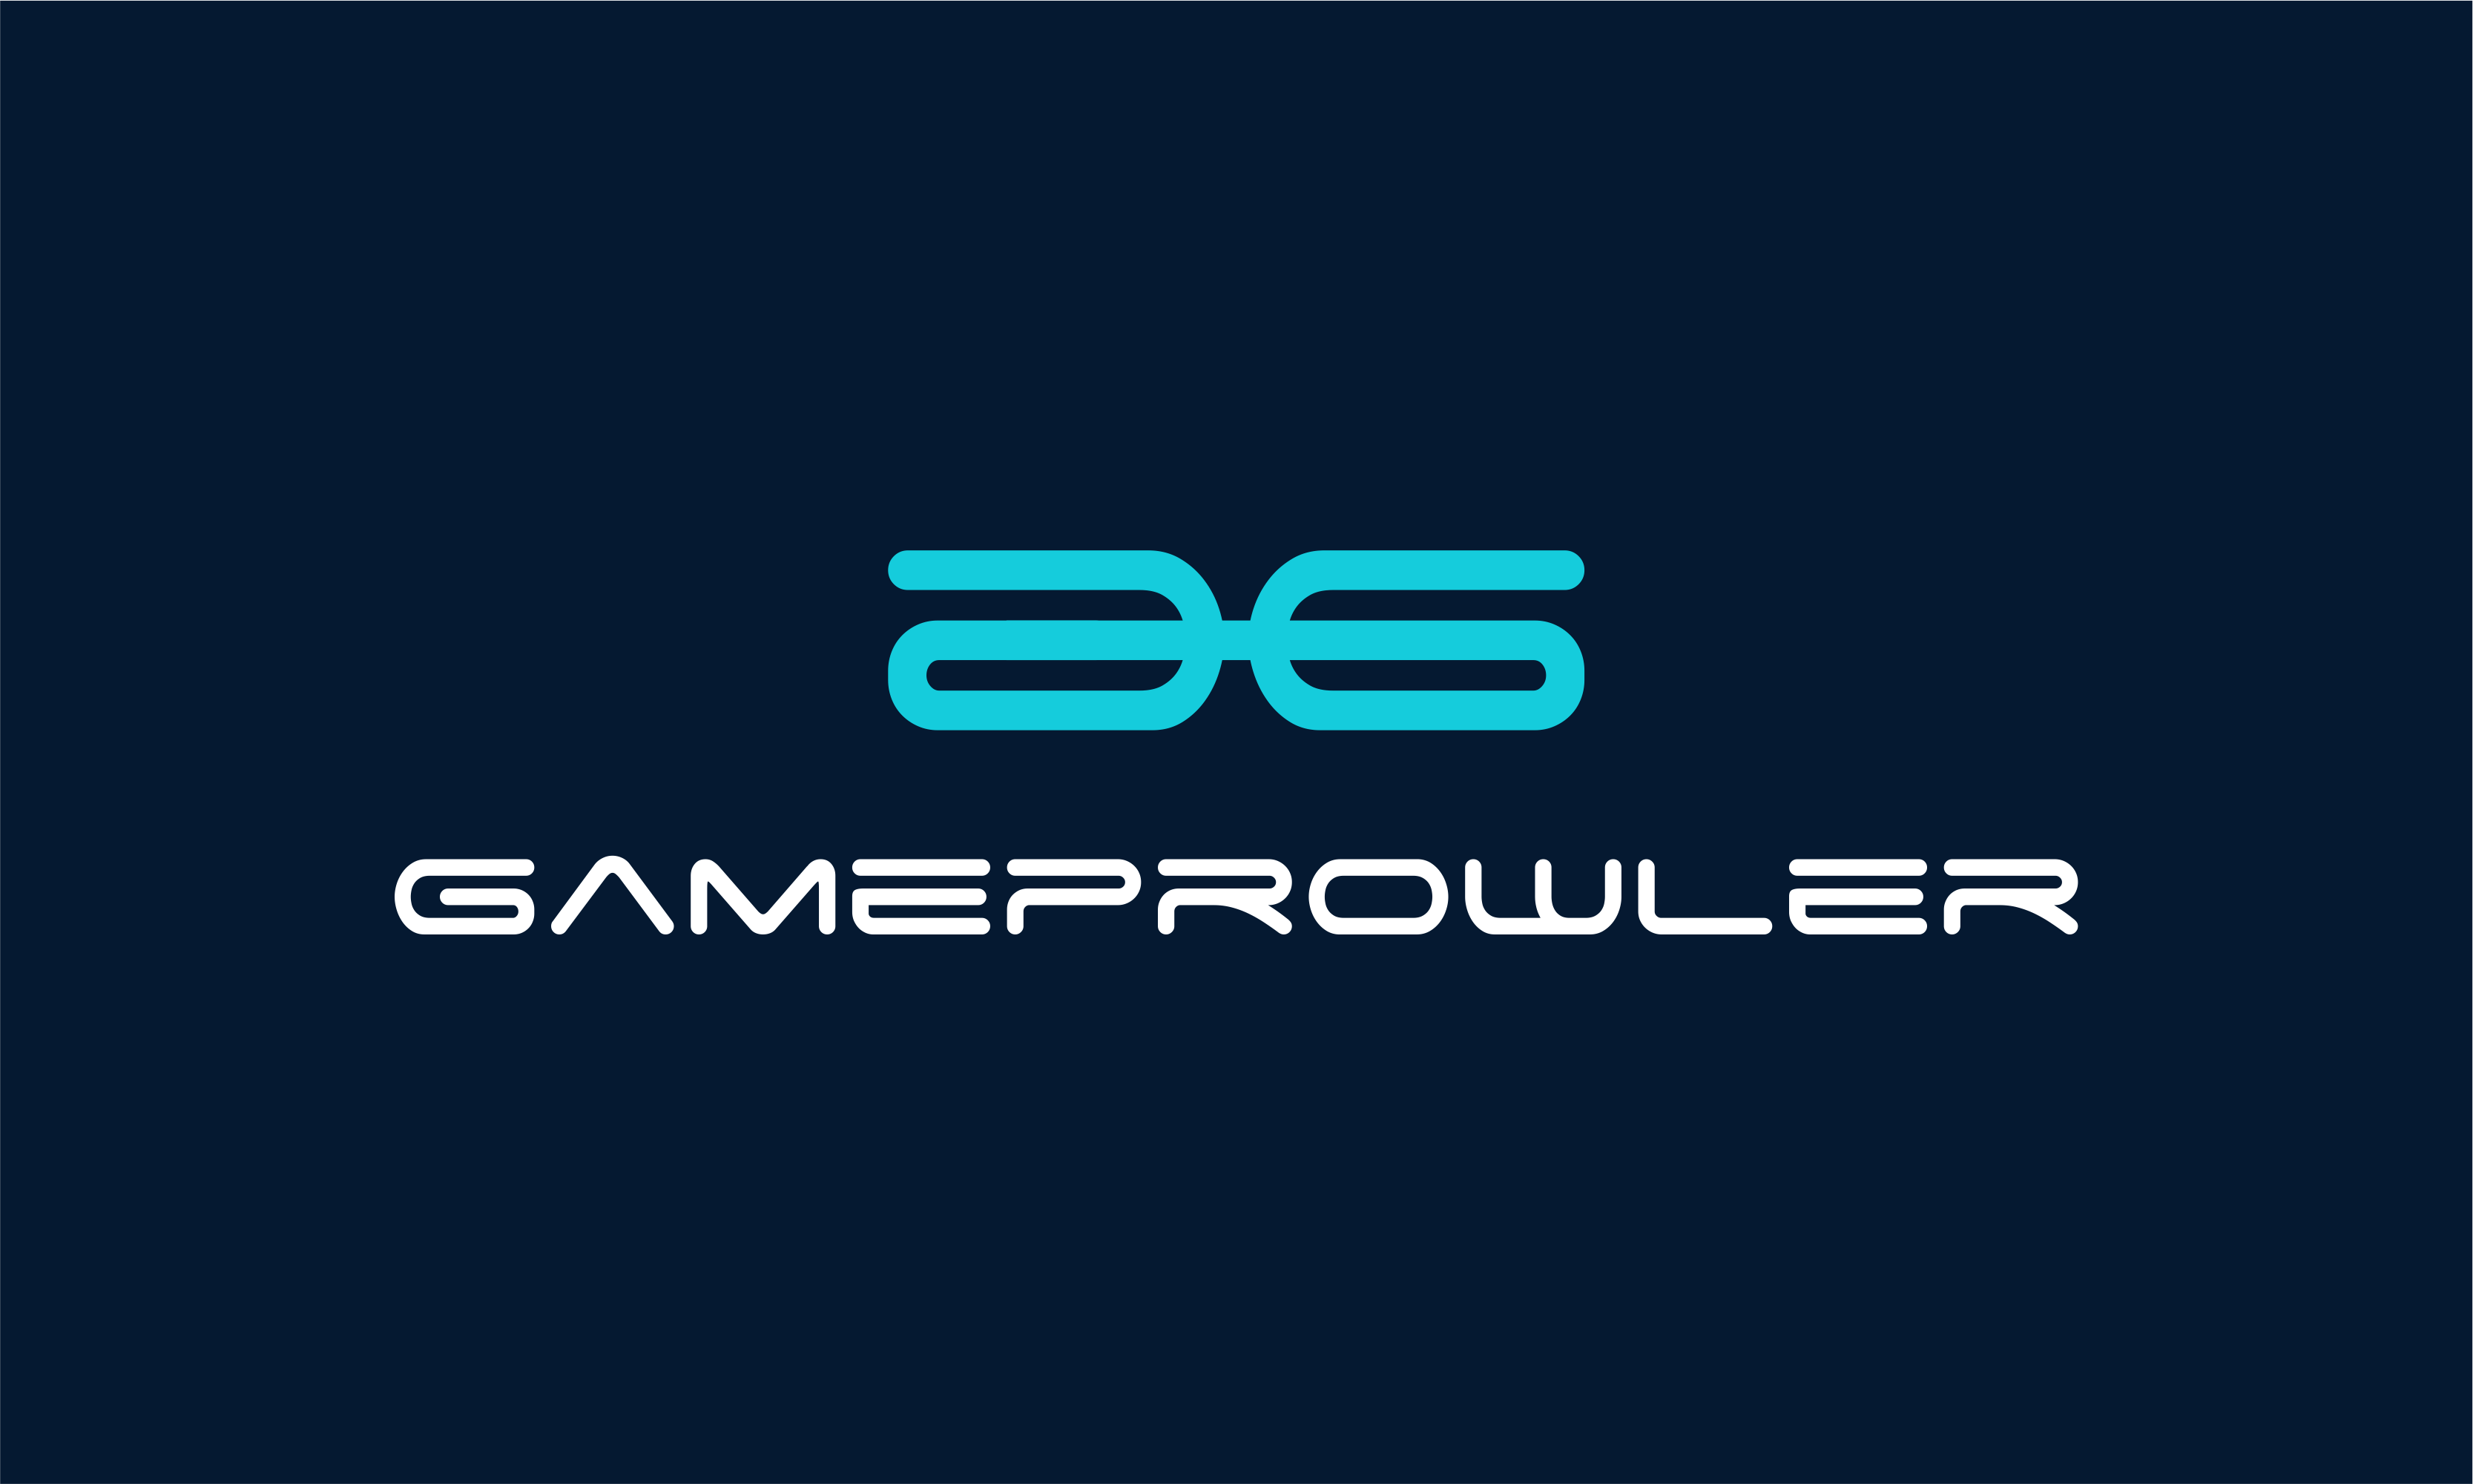 Gameprowler